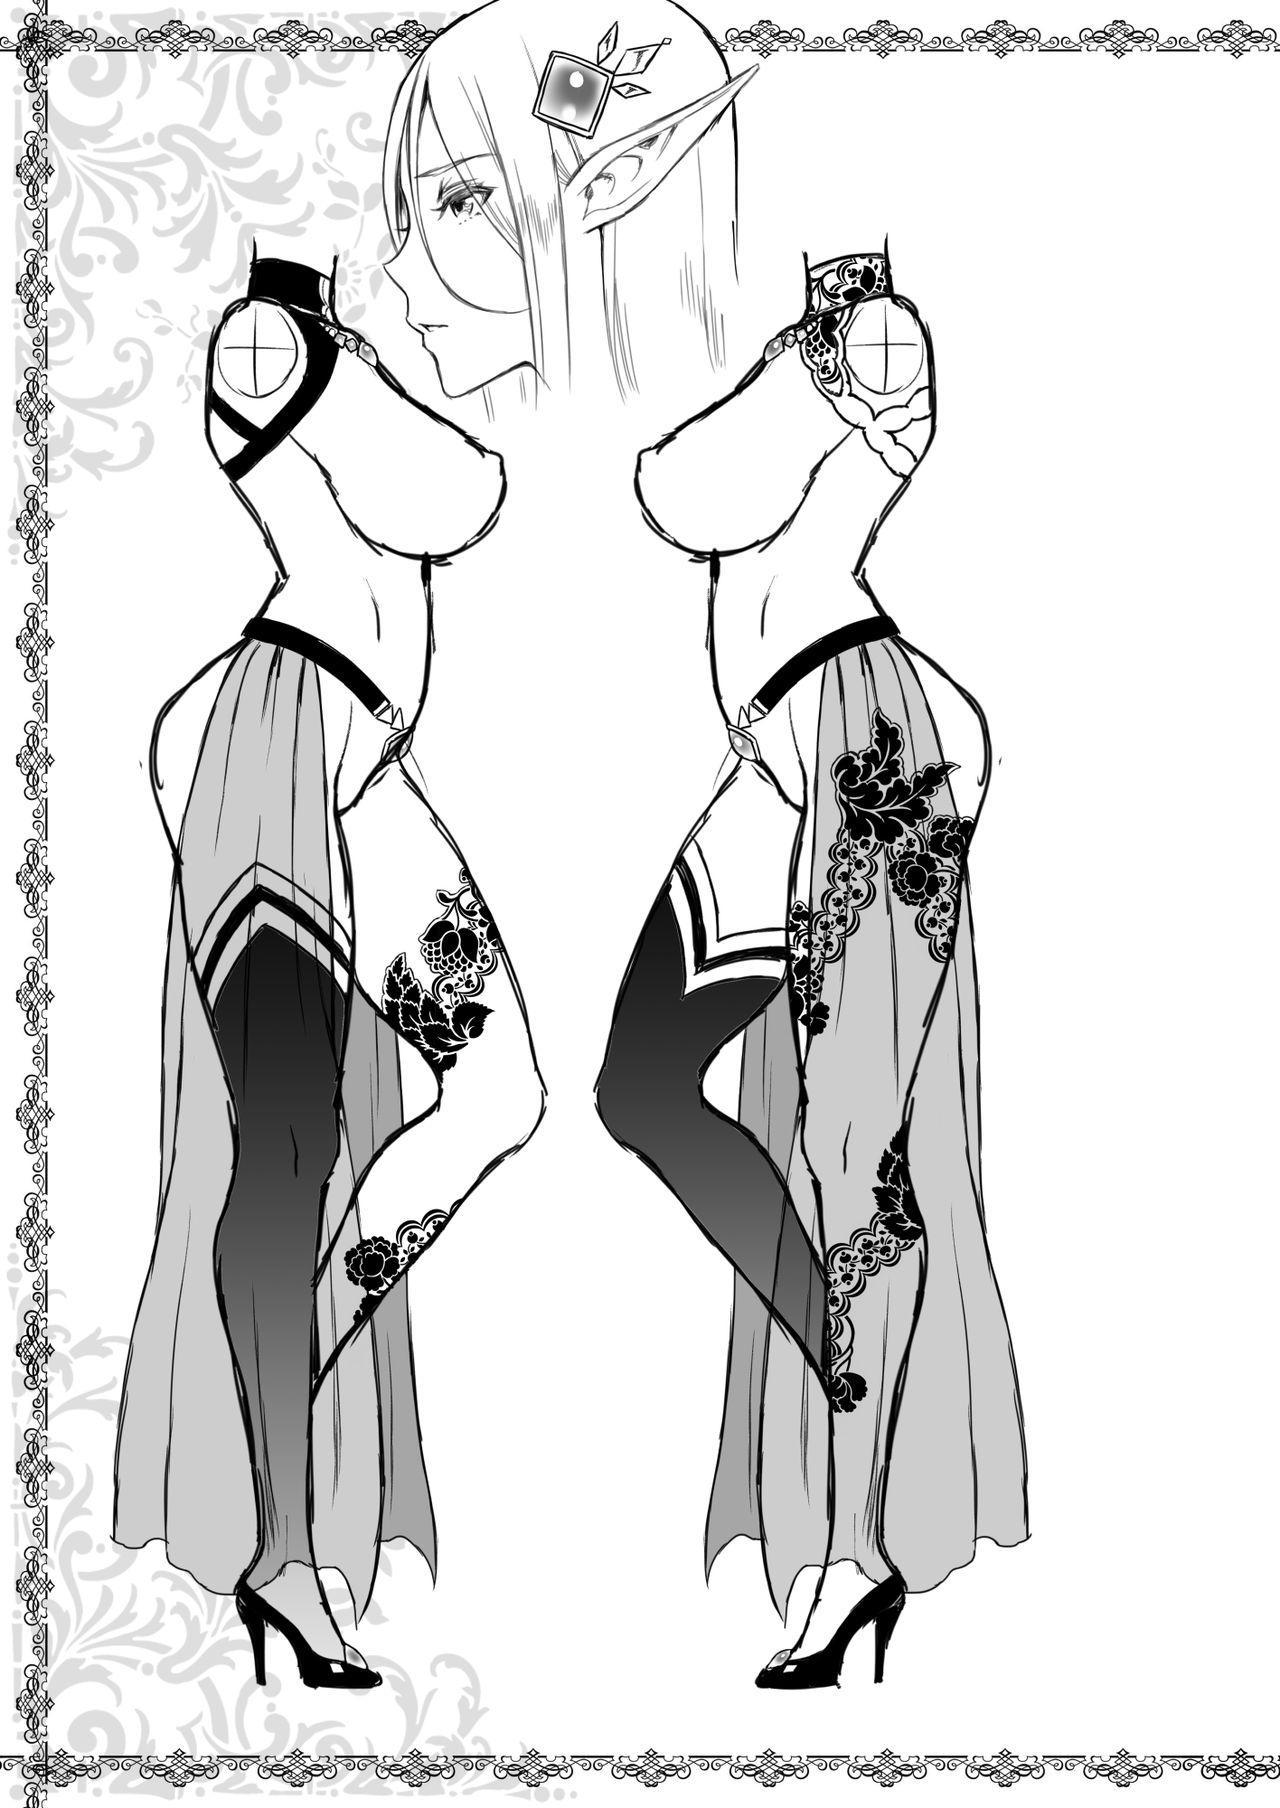 Tasogare no Shou Elf 5 | The Melancholy of the Prostitute Elf 5 37